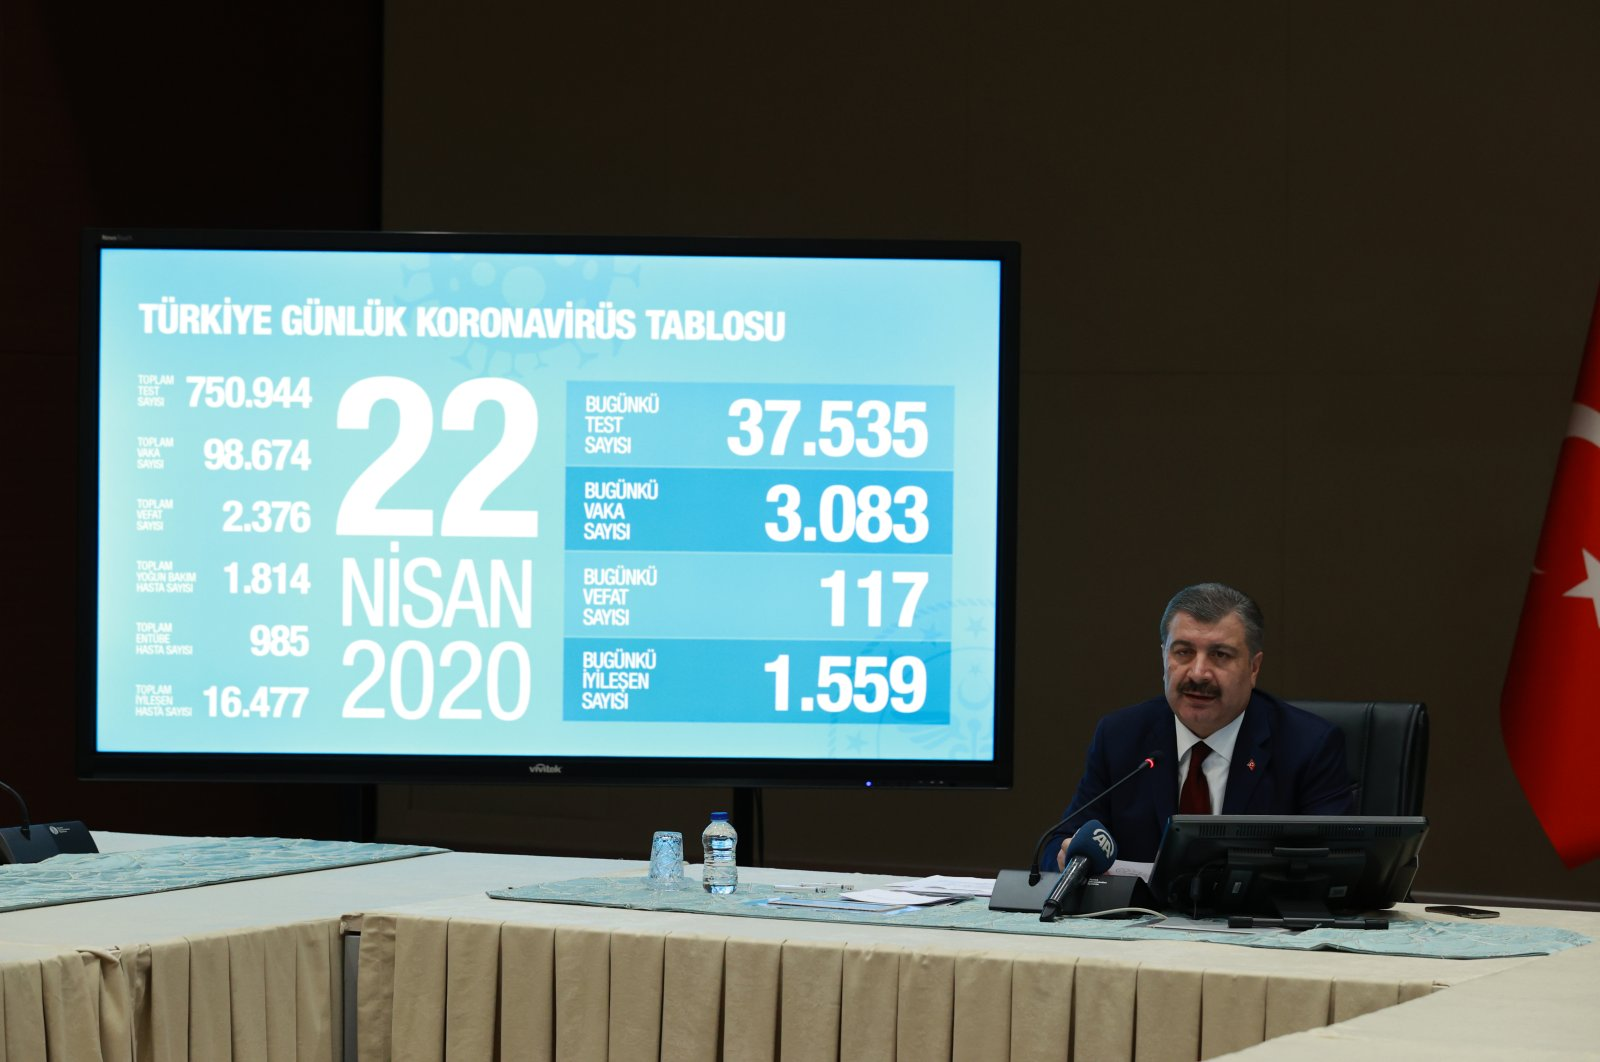 Health Minister Fahrettin Koca speaks at a press conference in the capital Ankara, Wednesday, April 22, 2020. (AA Photo)